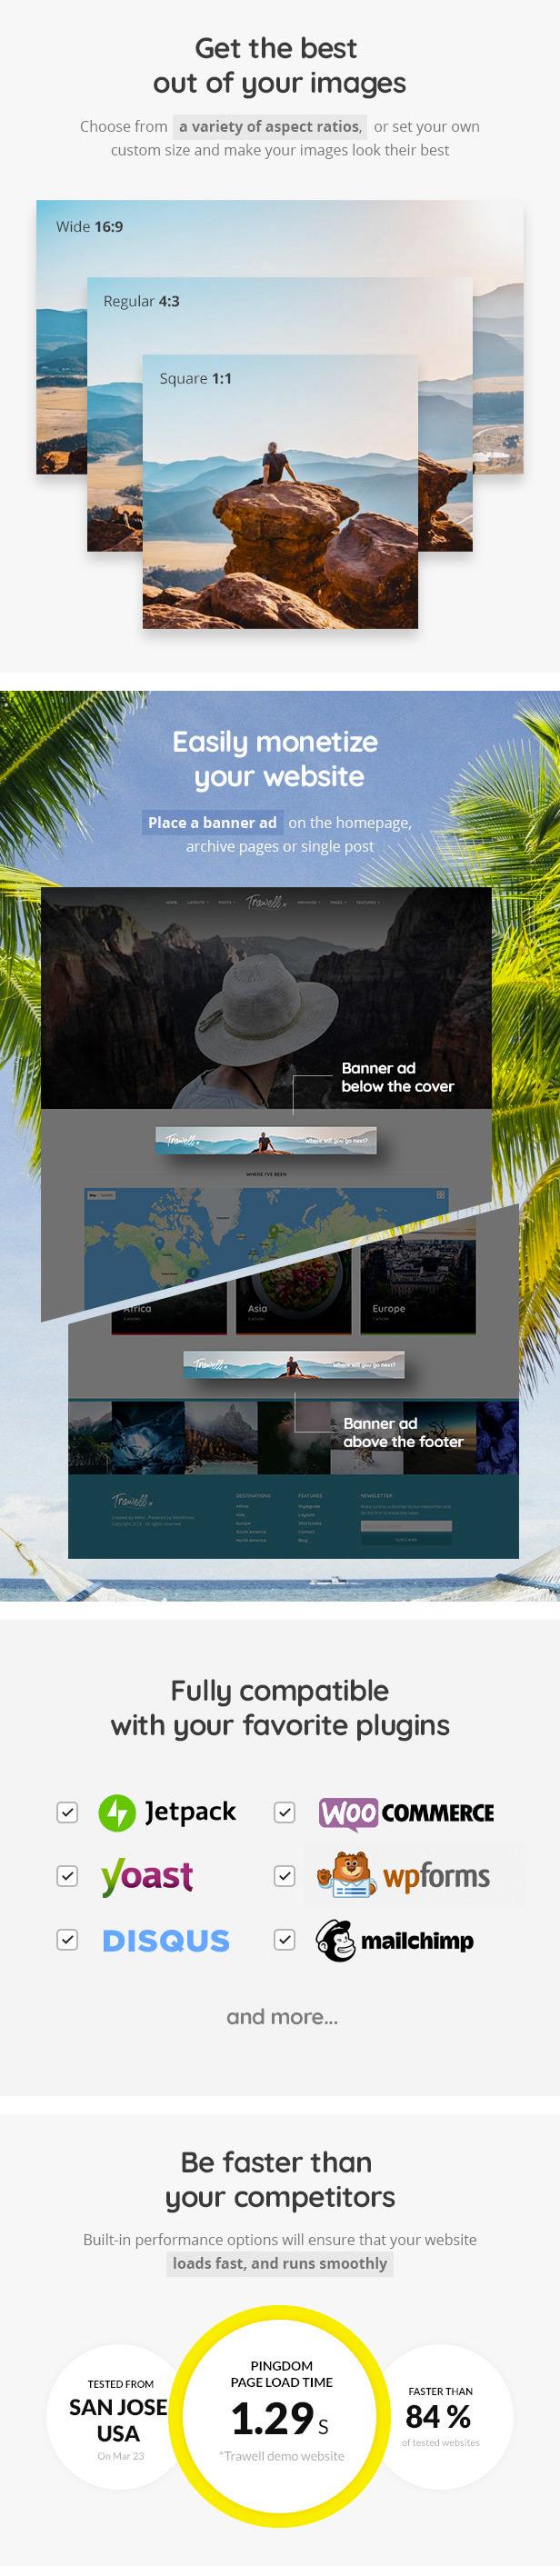 Trawell - WordPress-Reisethema